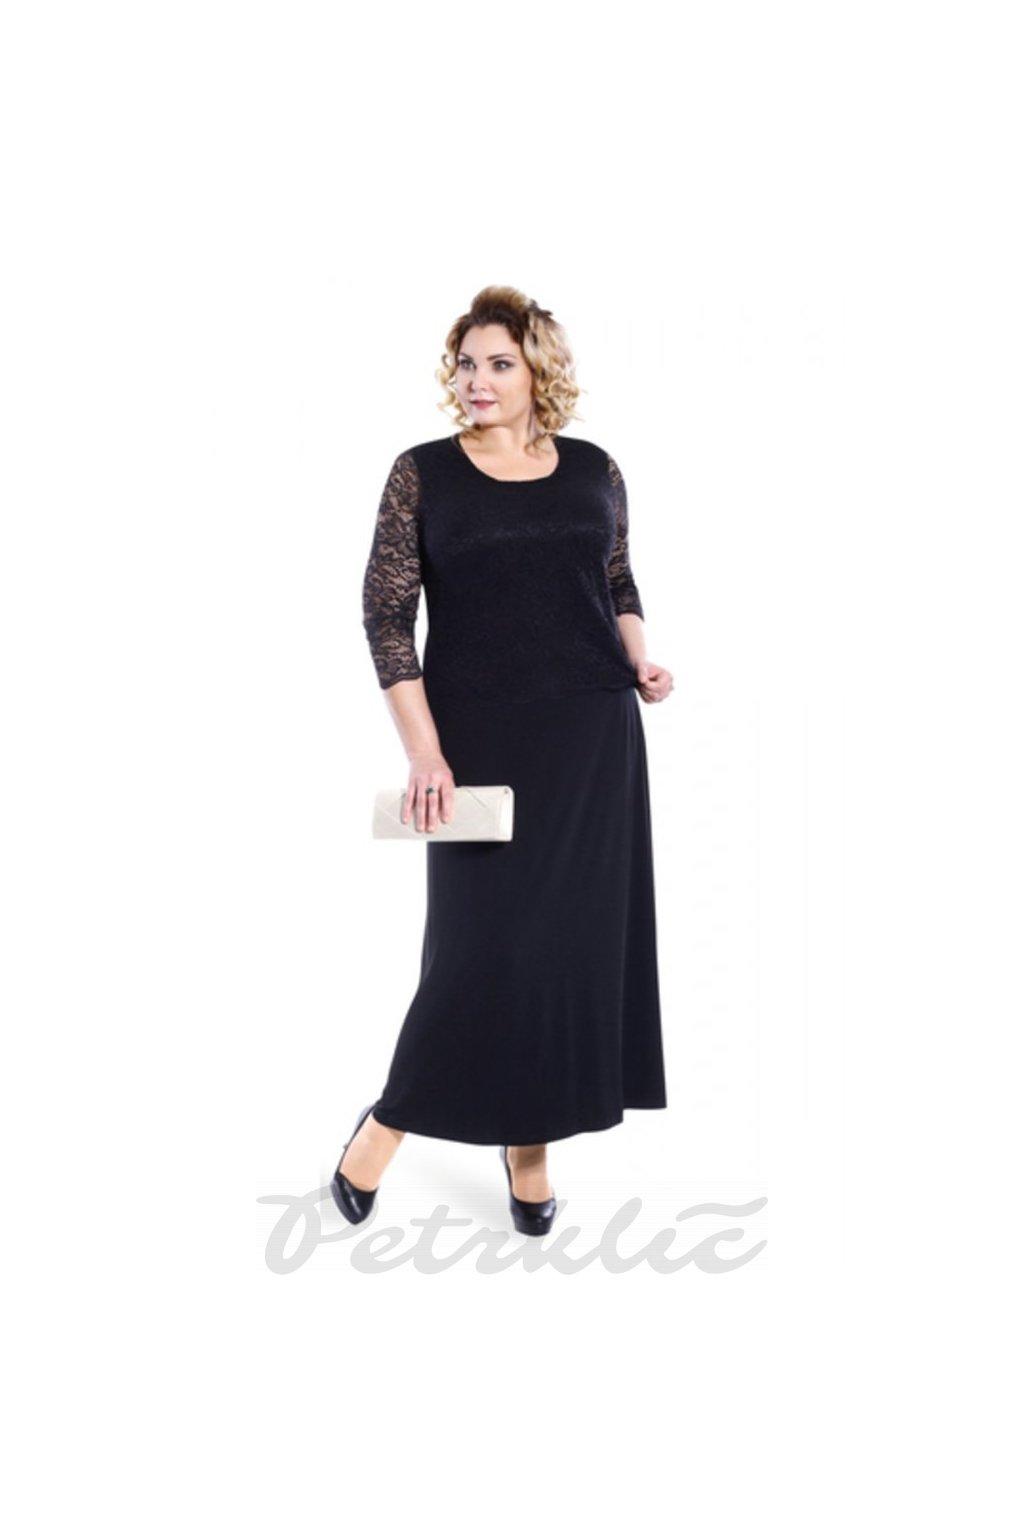 KOMETA - šaty 110 - 115 cm, 3/4 rukáv.